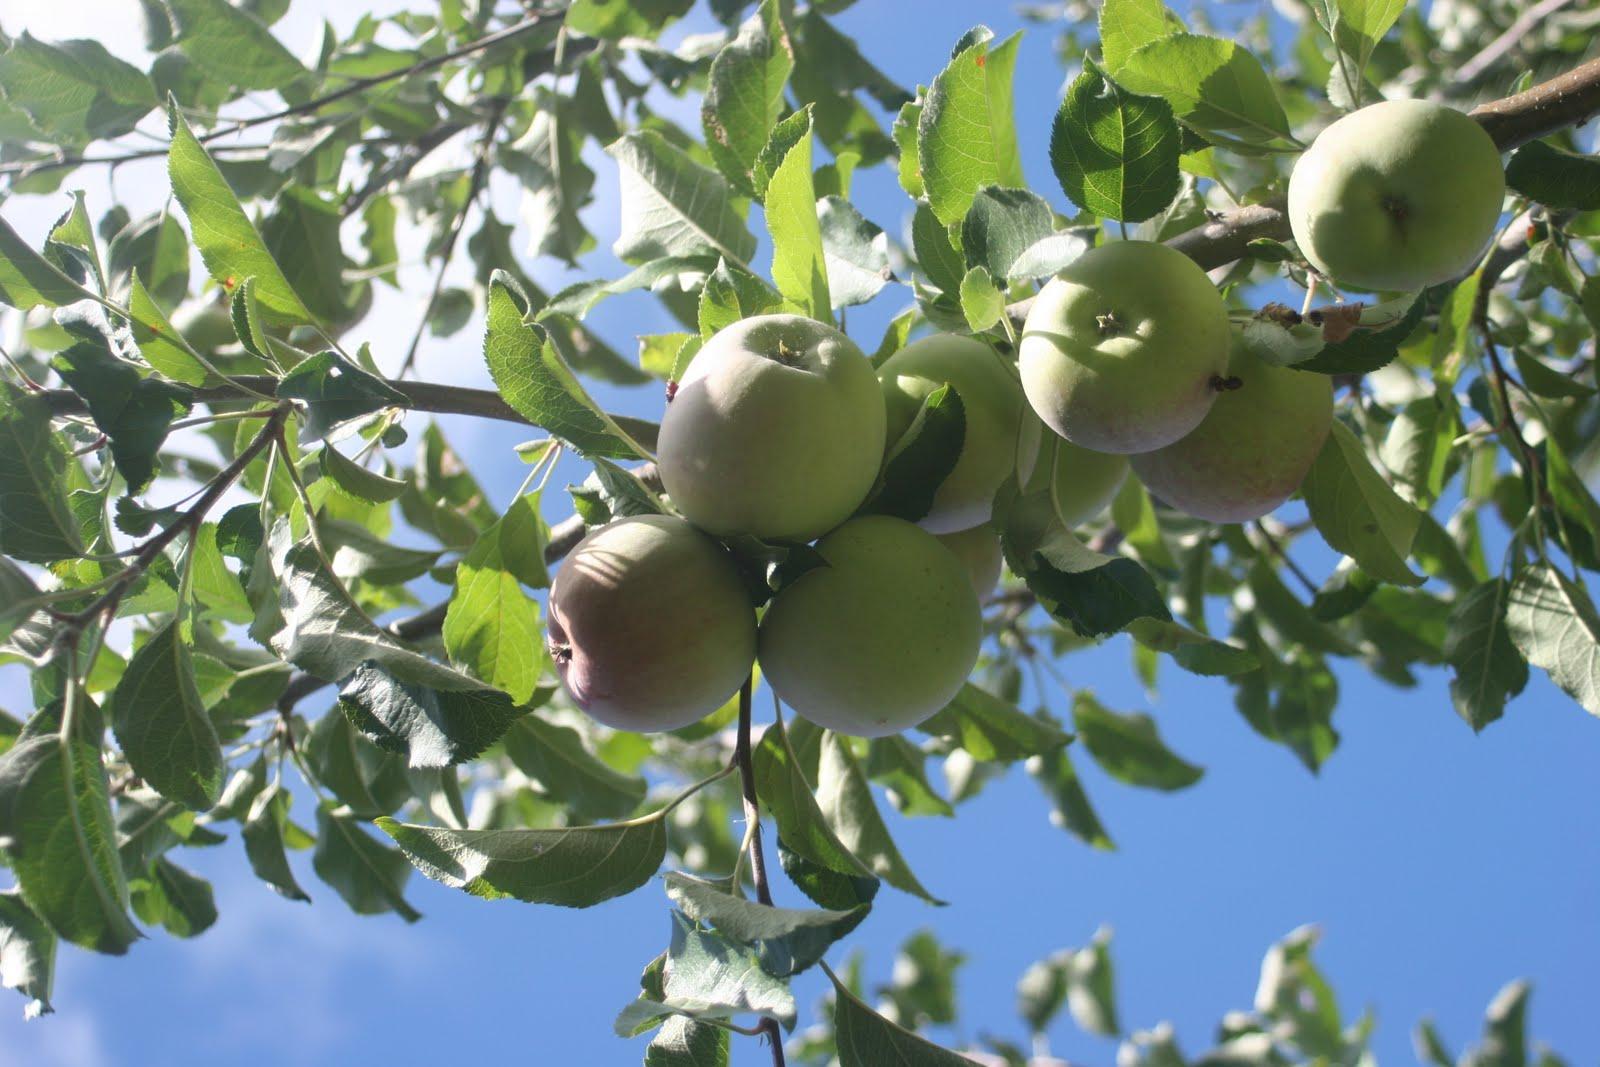 homemade creations backyard apple trees and handmade quilts society